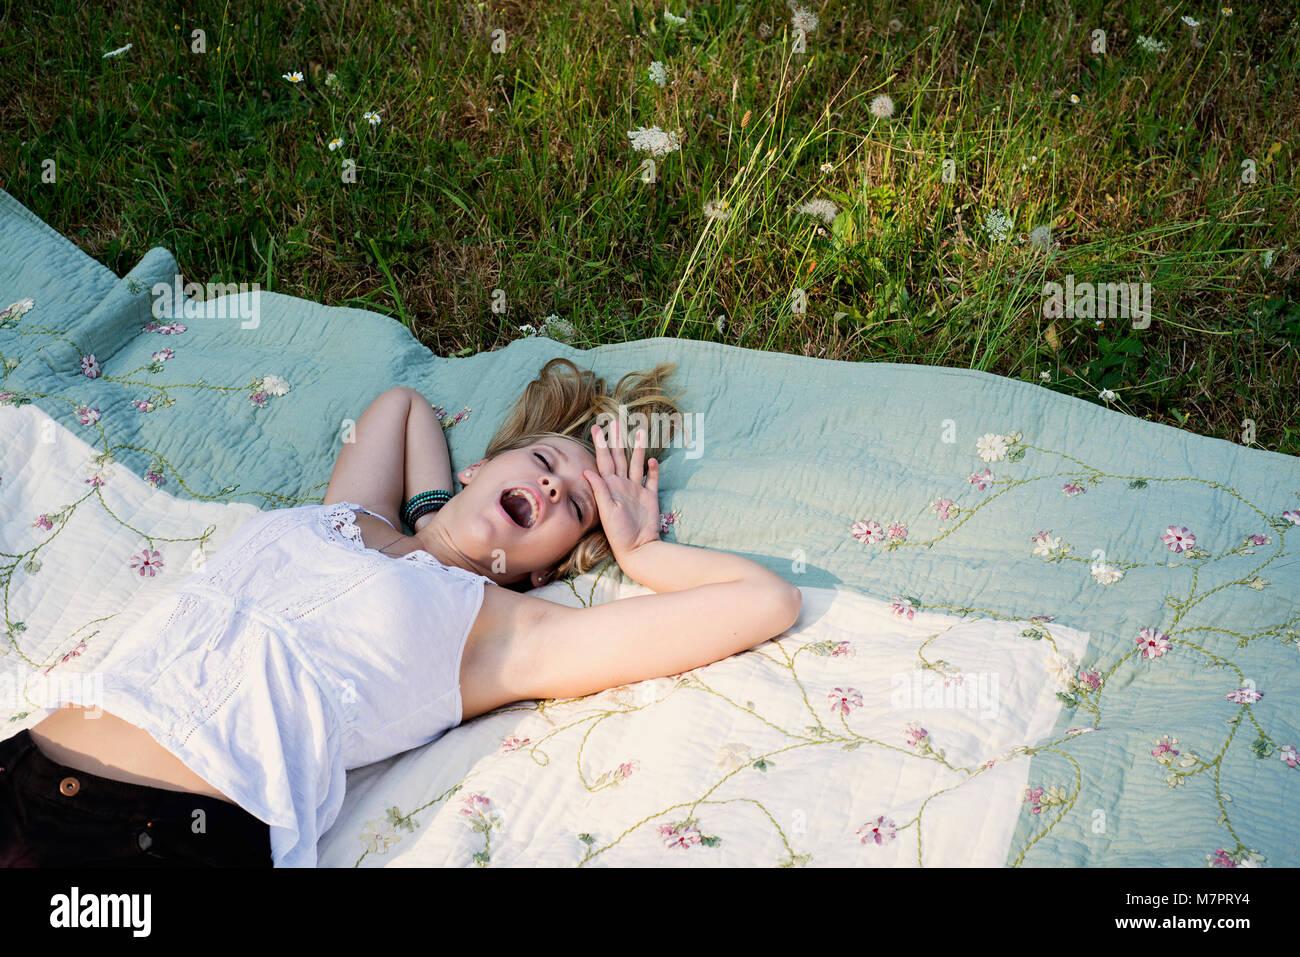 Teenaged girl yawning in the grass - Stock Image